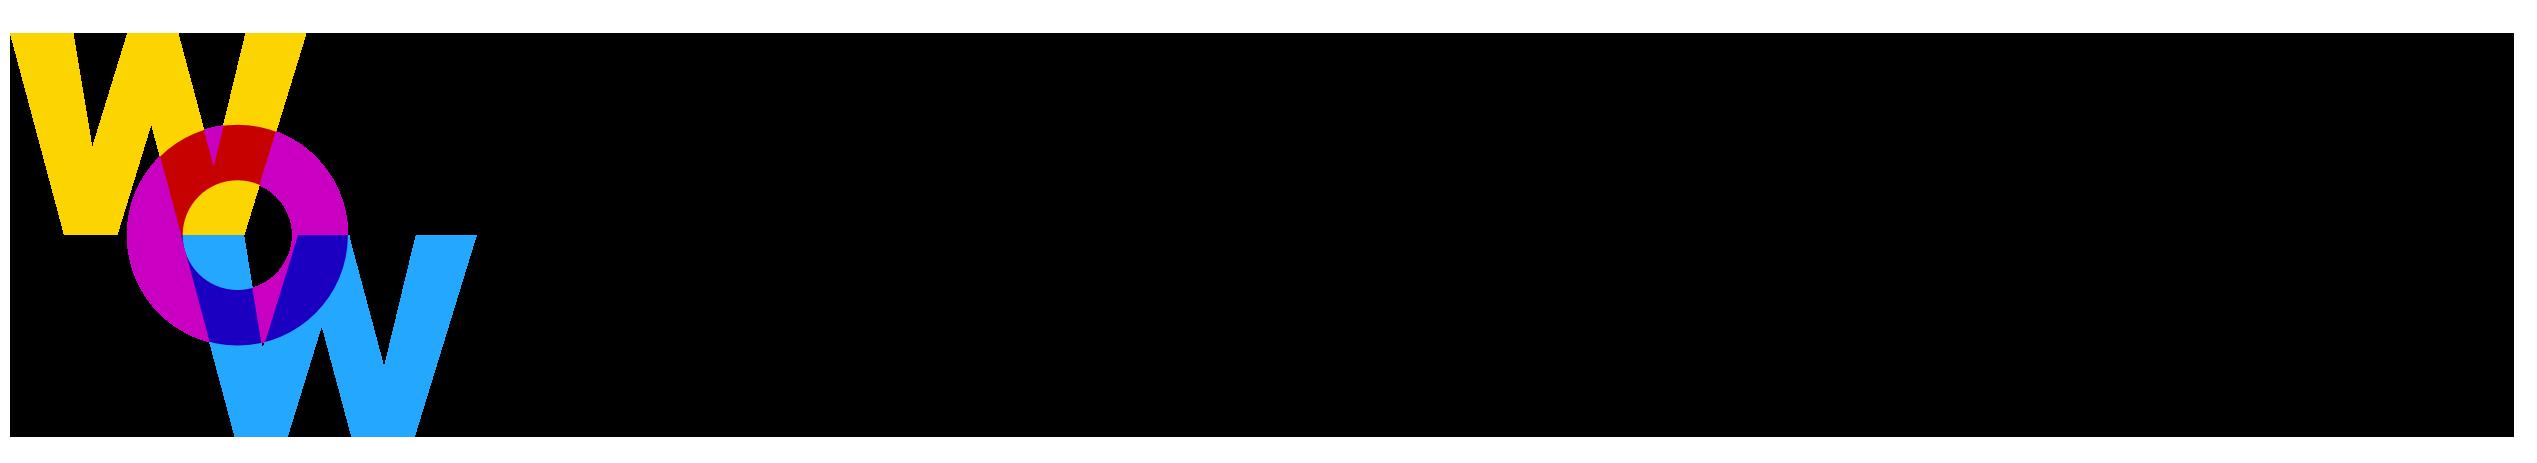 WOW_logo-2